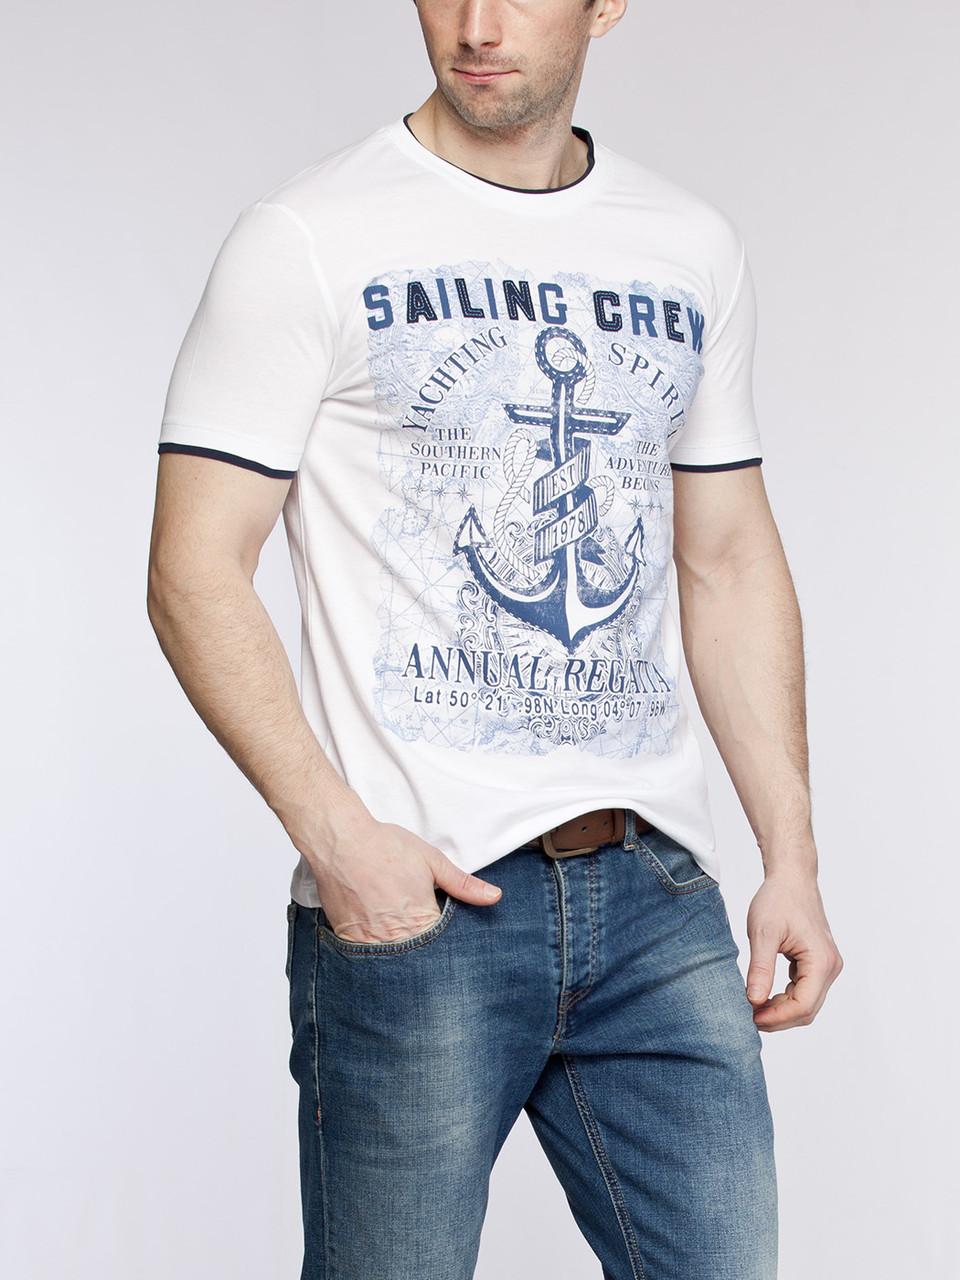 Мужская футболка белая LC Waikiki /ЛС Вайкики с надписью Sailing Crew